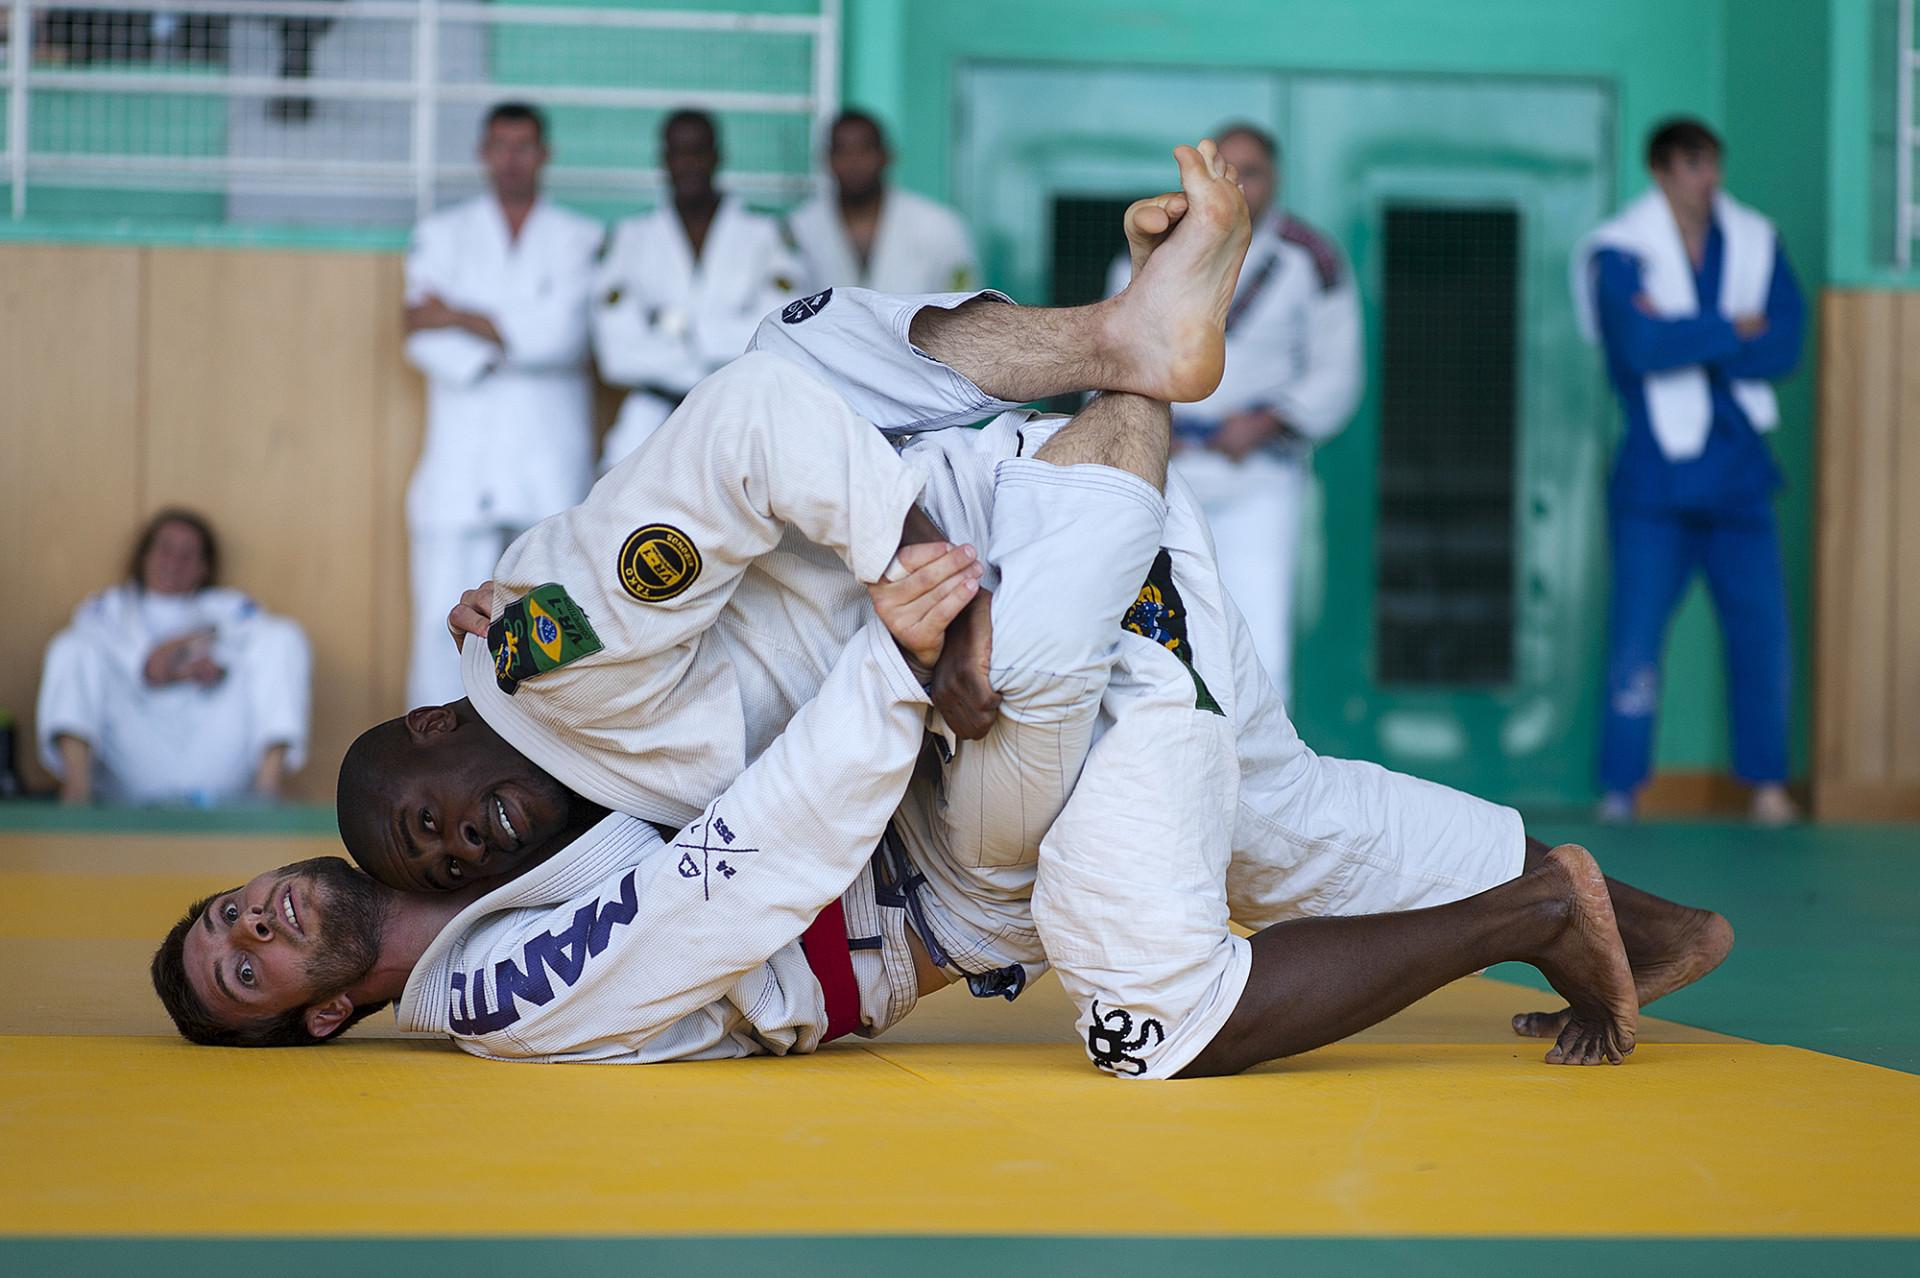 Rencontre internationale de Jujitsu